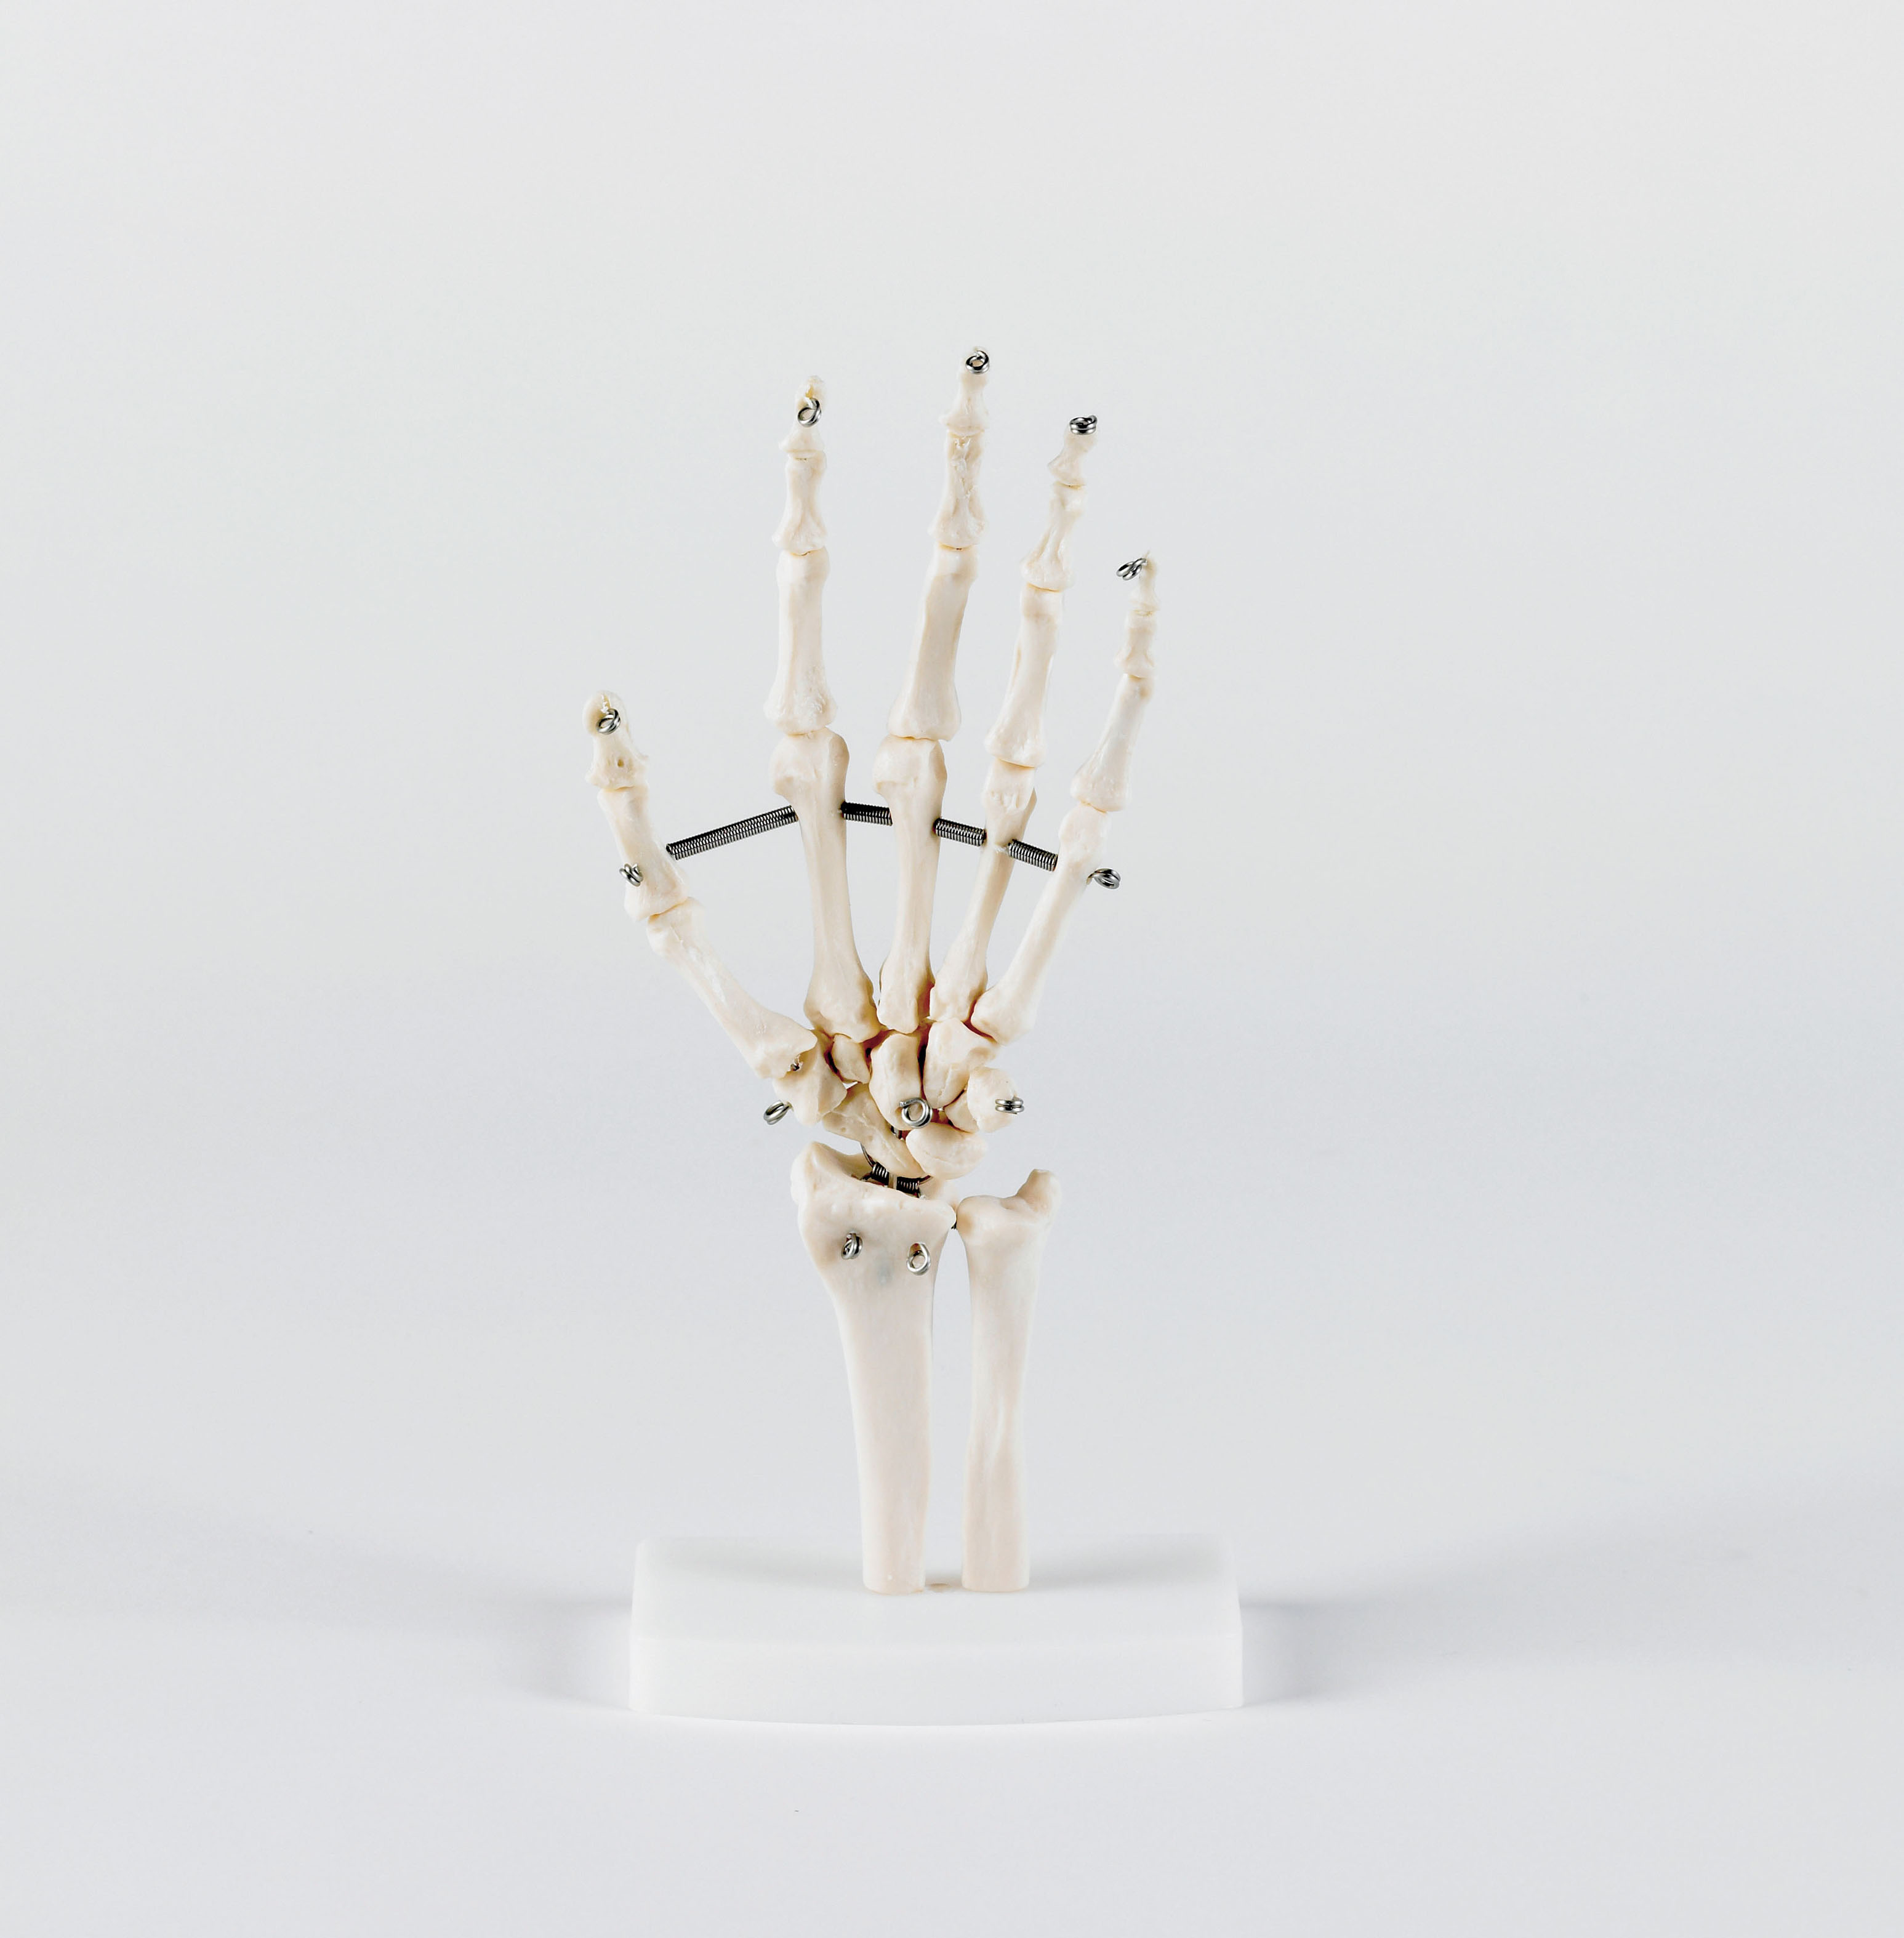 Articulation de la main